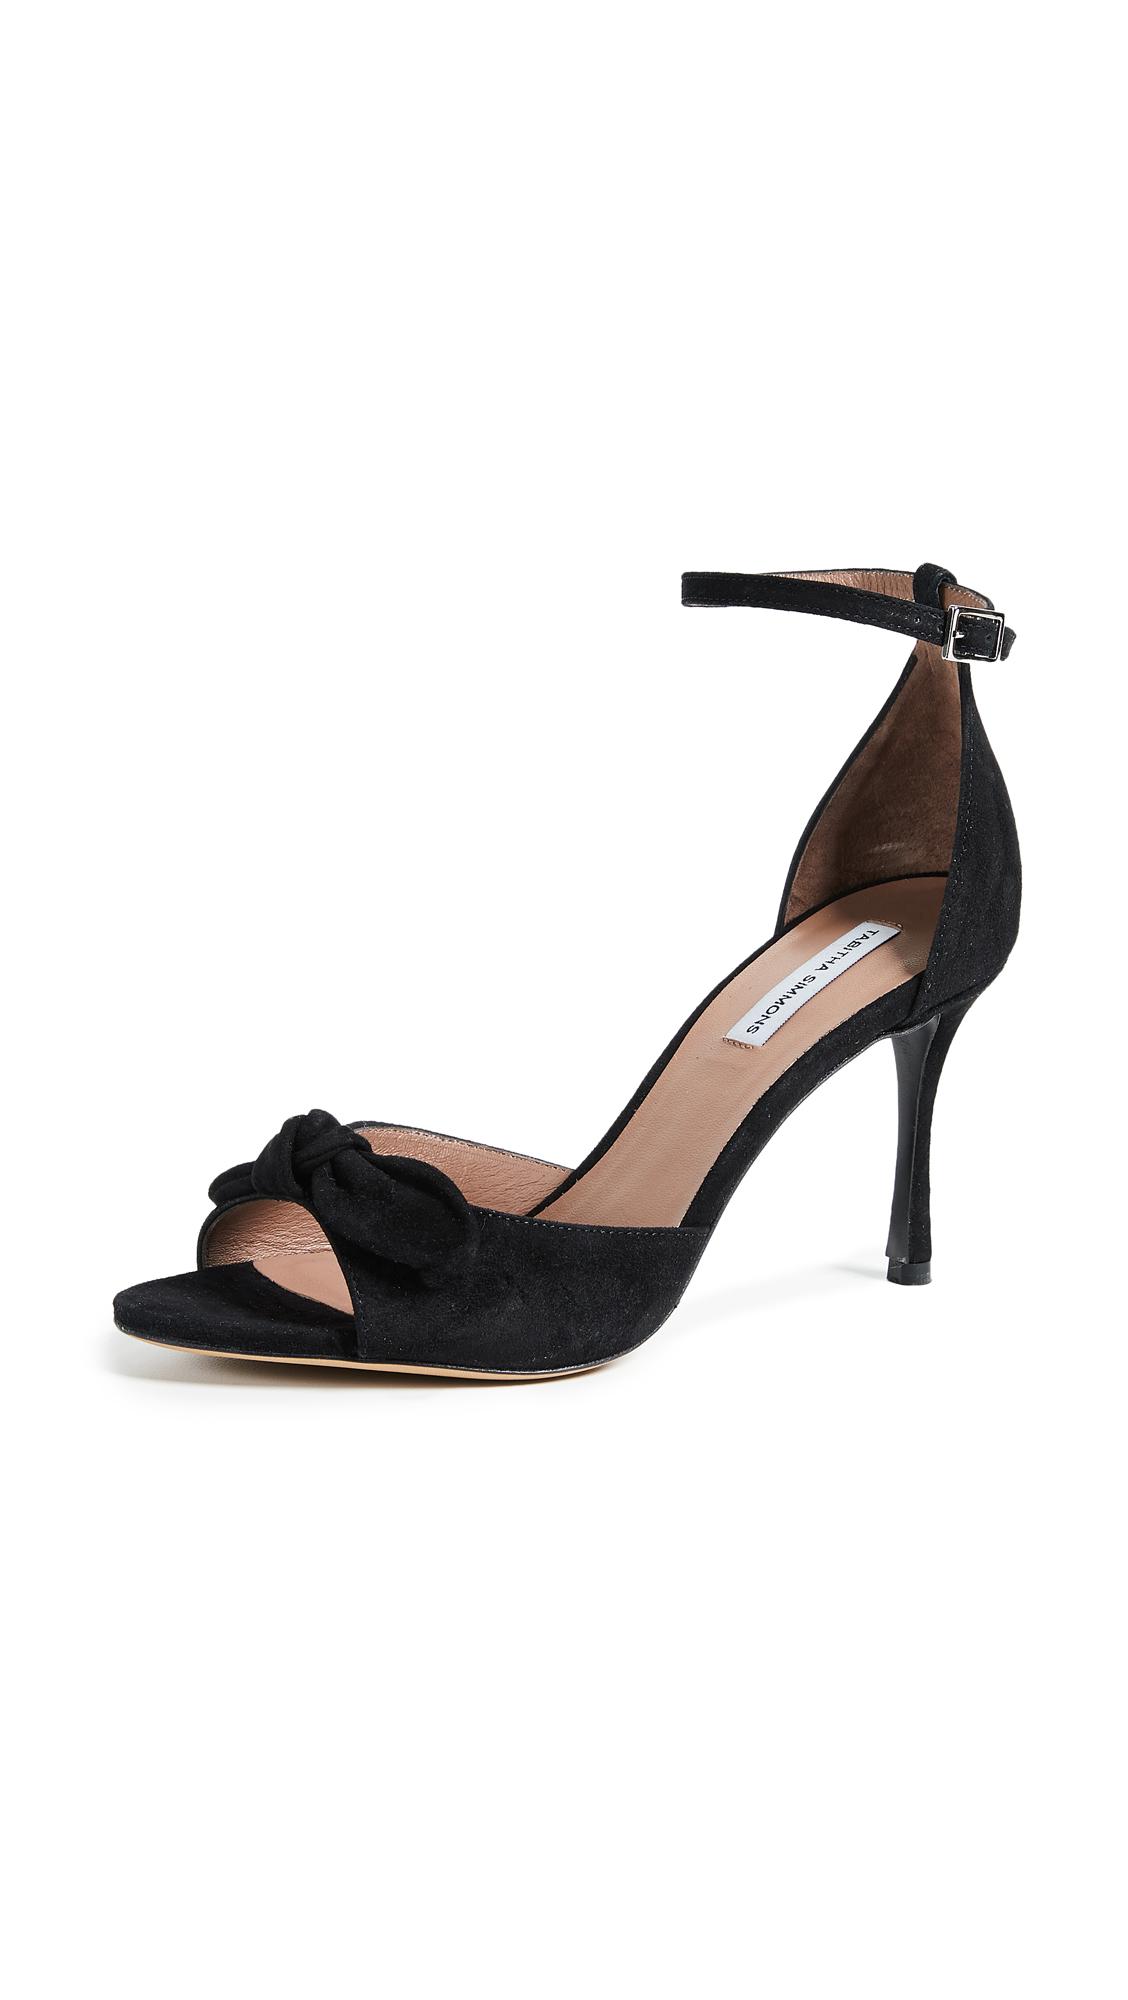 Tabitha Simmons Mimmi Ankle Strap Pumps - Black